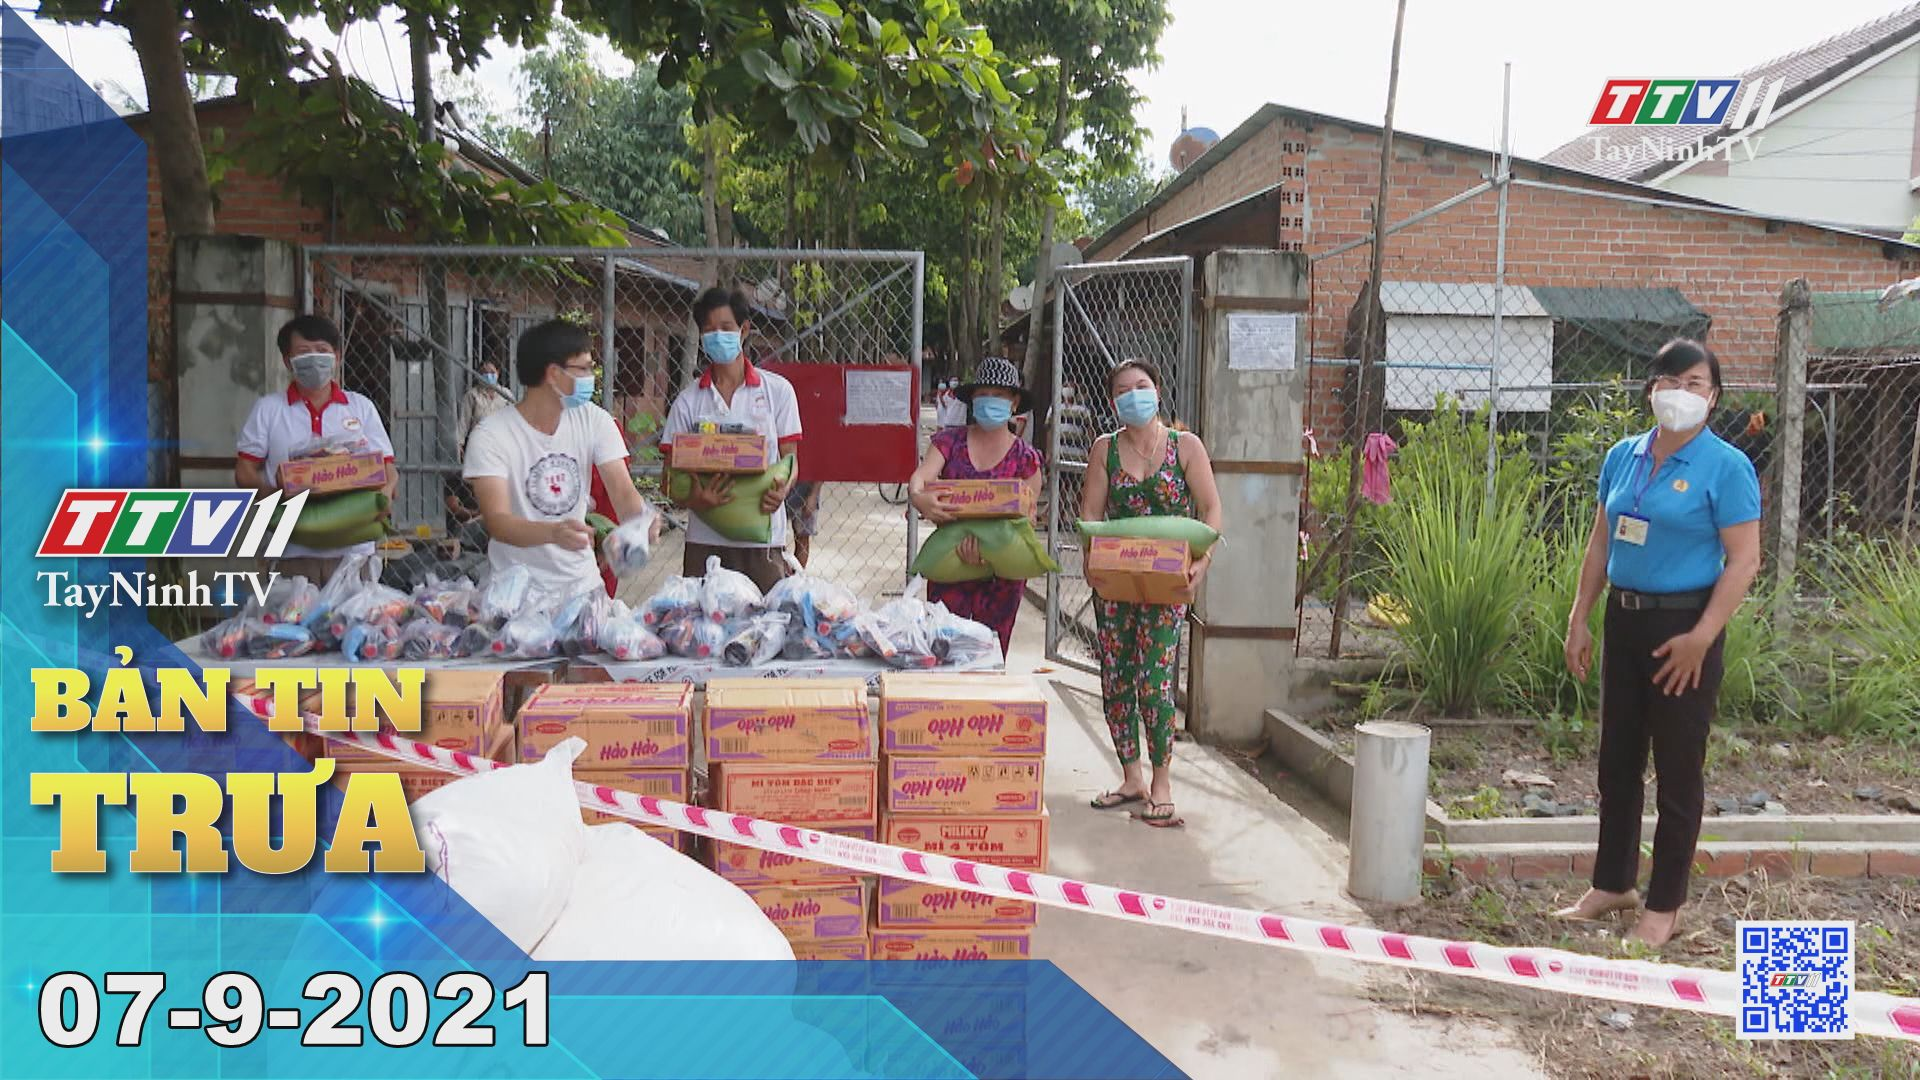 Bản tin trưa 07-9-2021 | Tin tức hôm nay | TayNinhTV